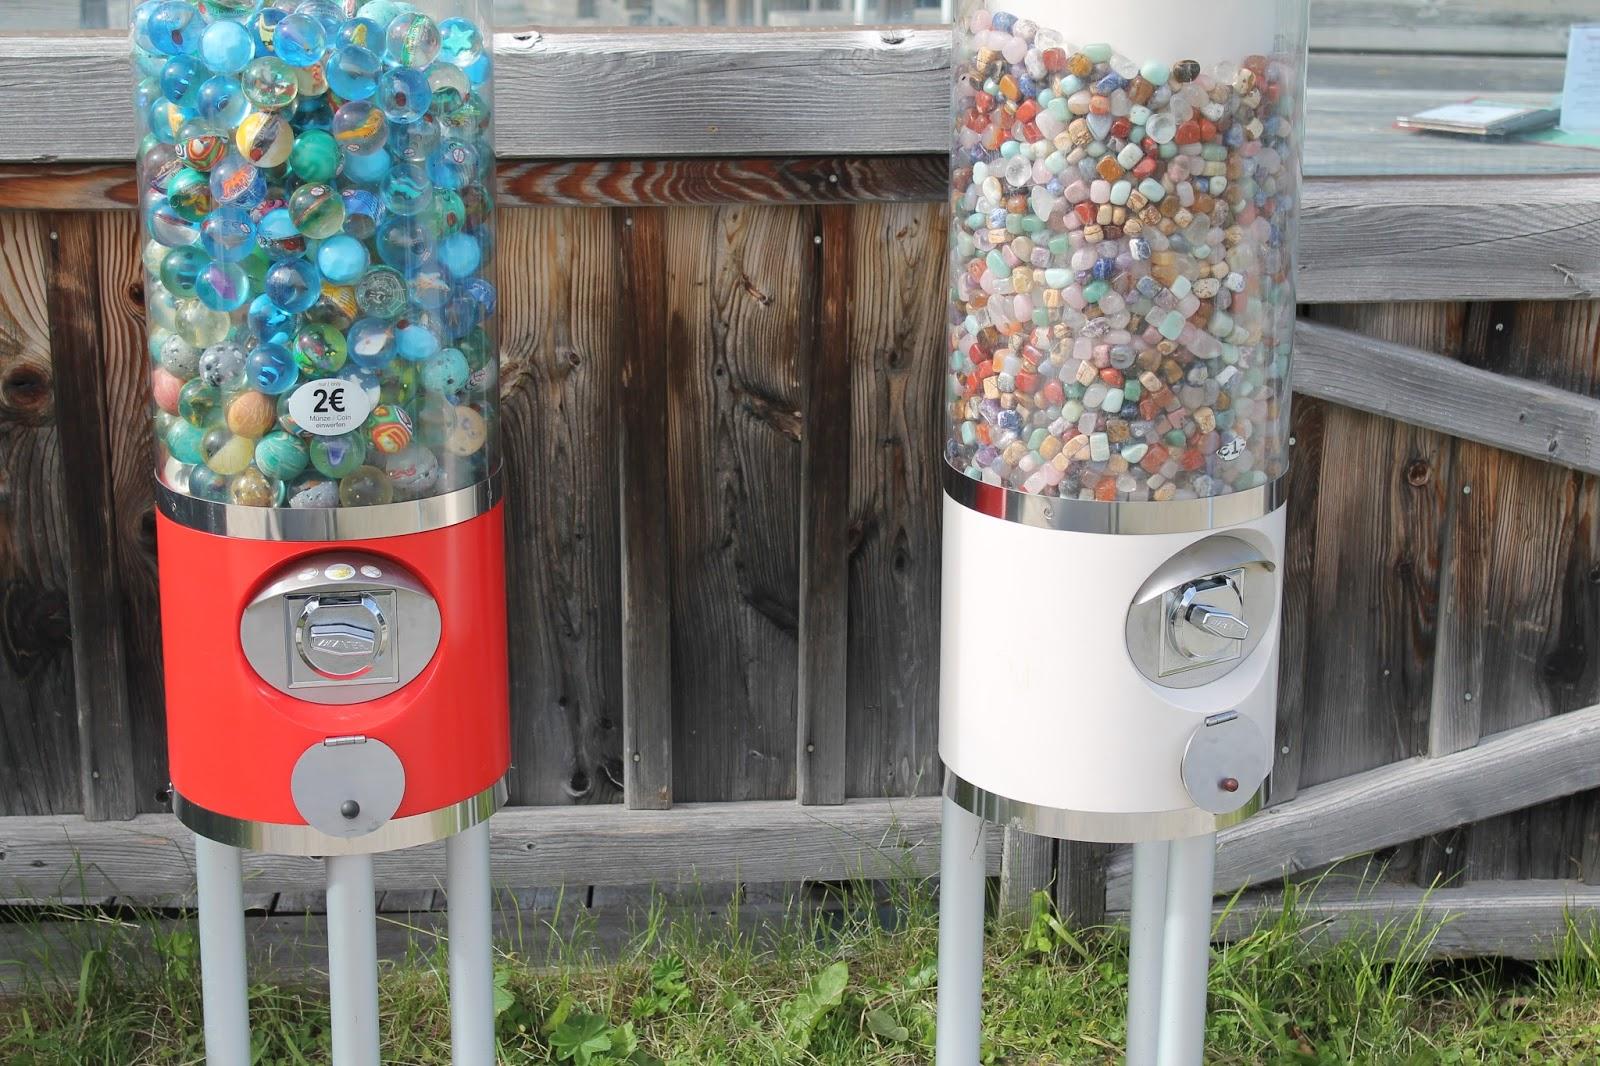 Edelsteine Flummis Automat